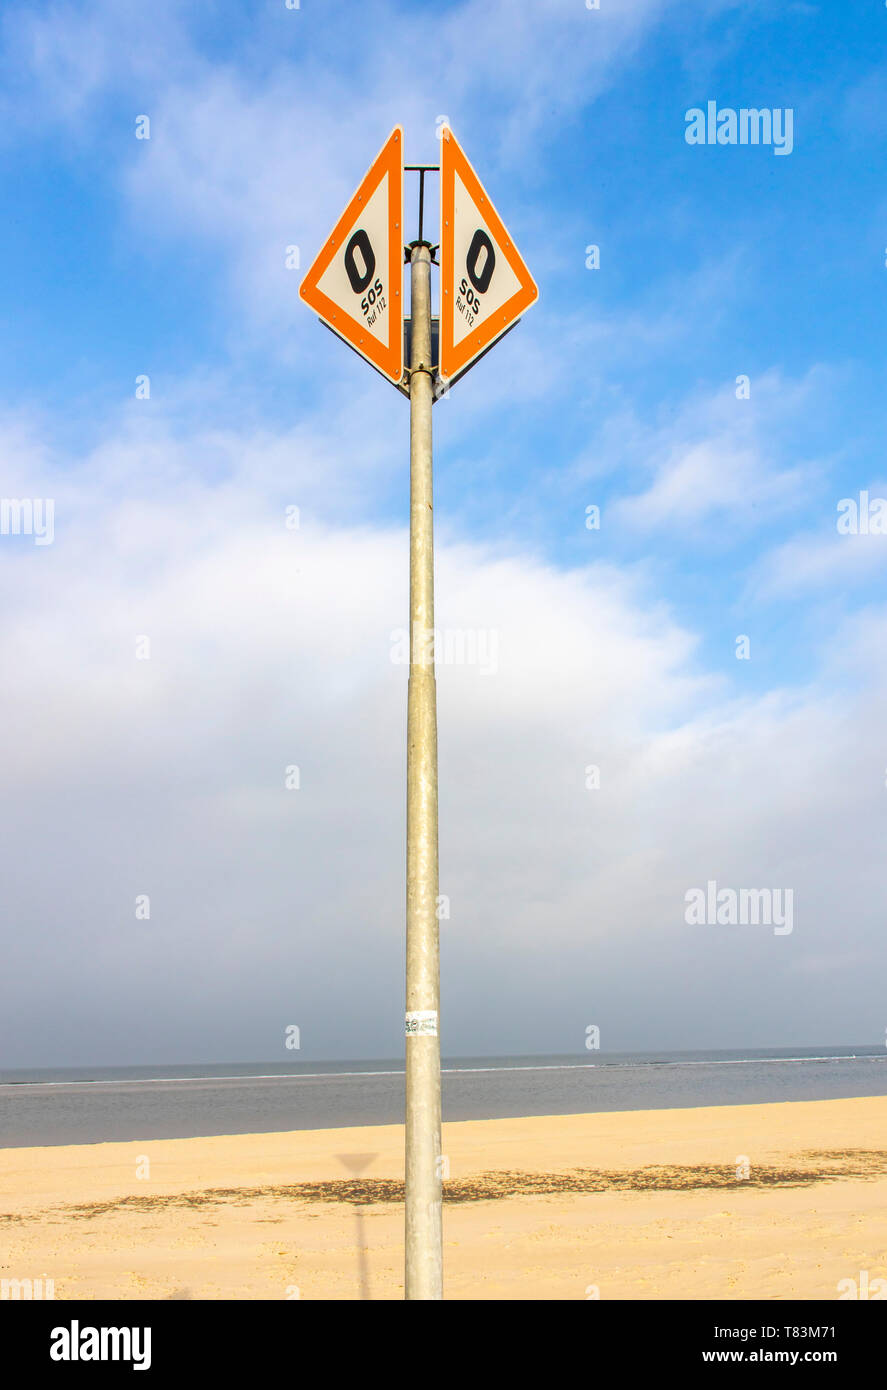 East Frisian Nordsee Insel Spiekeroog, Nationalpark Wattenmeer, im Winter, SOS, Notruf Zeichen, Strandabschnitt - Stock Image